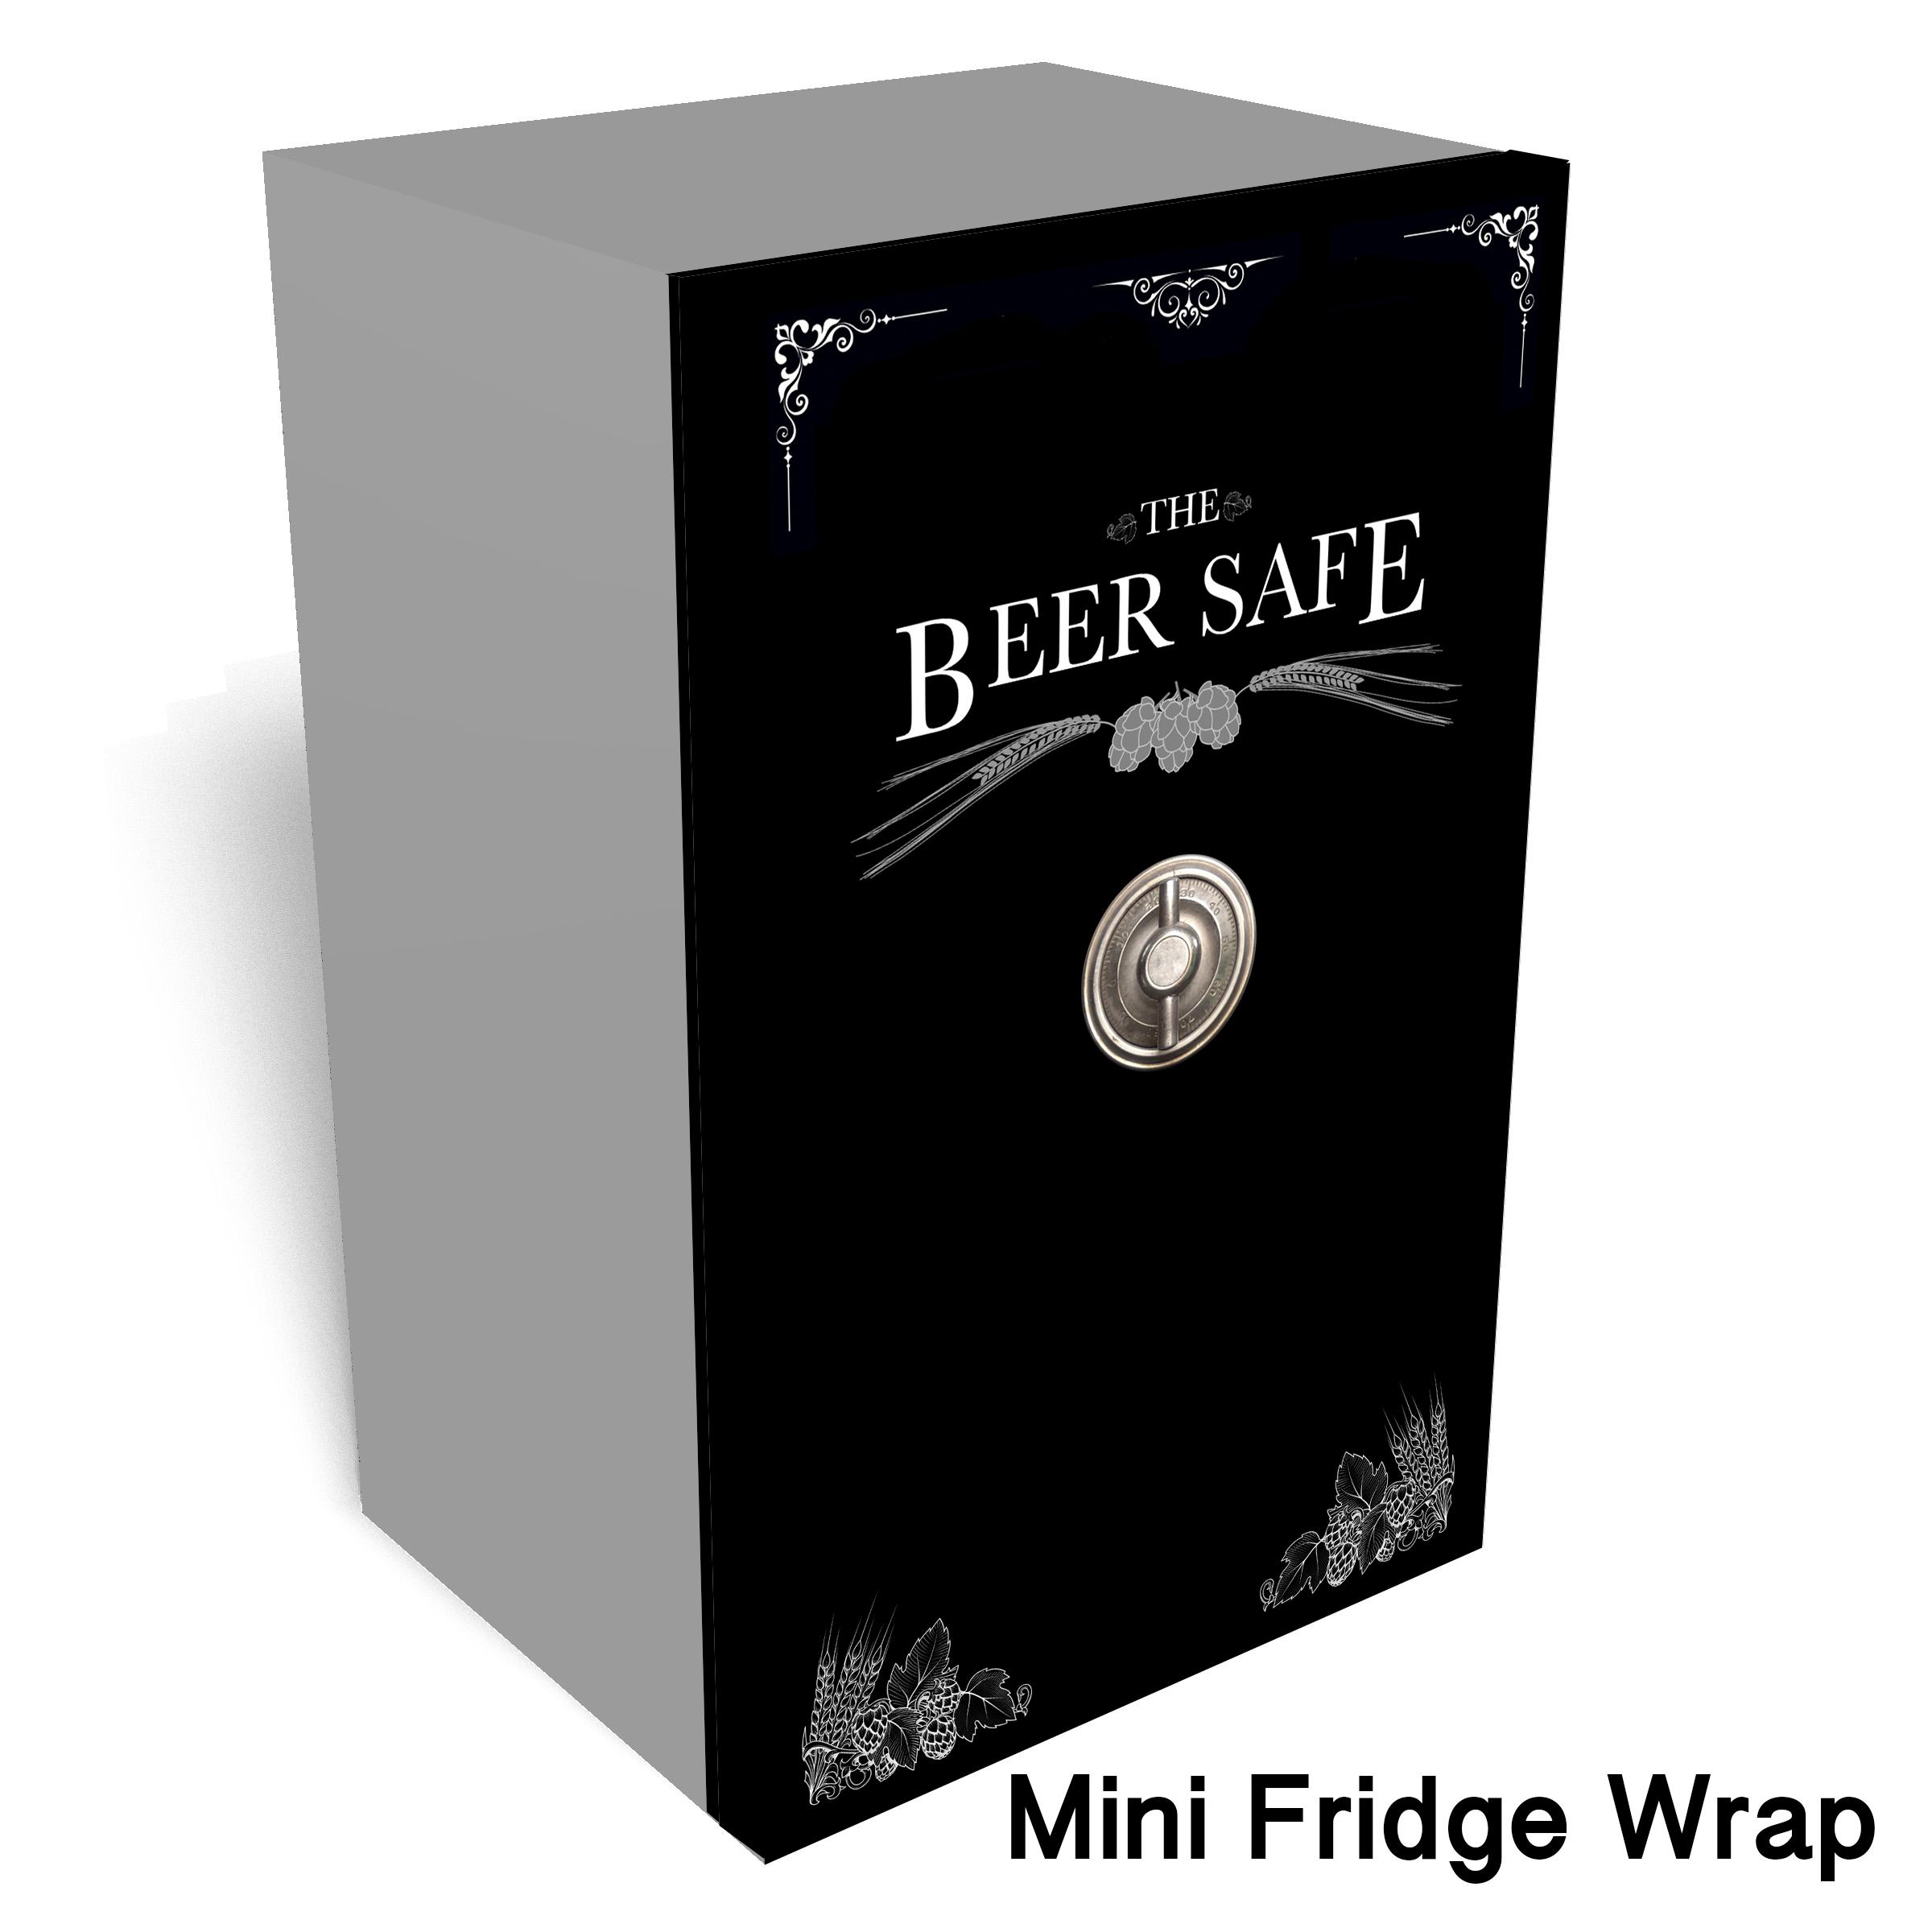 Beer Safe Mini Fridge Wrap